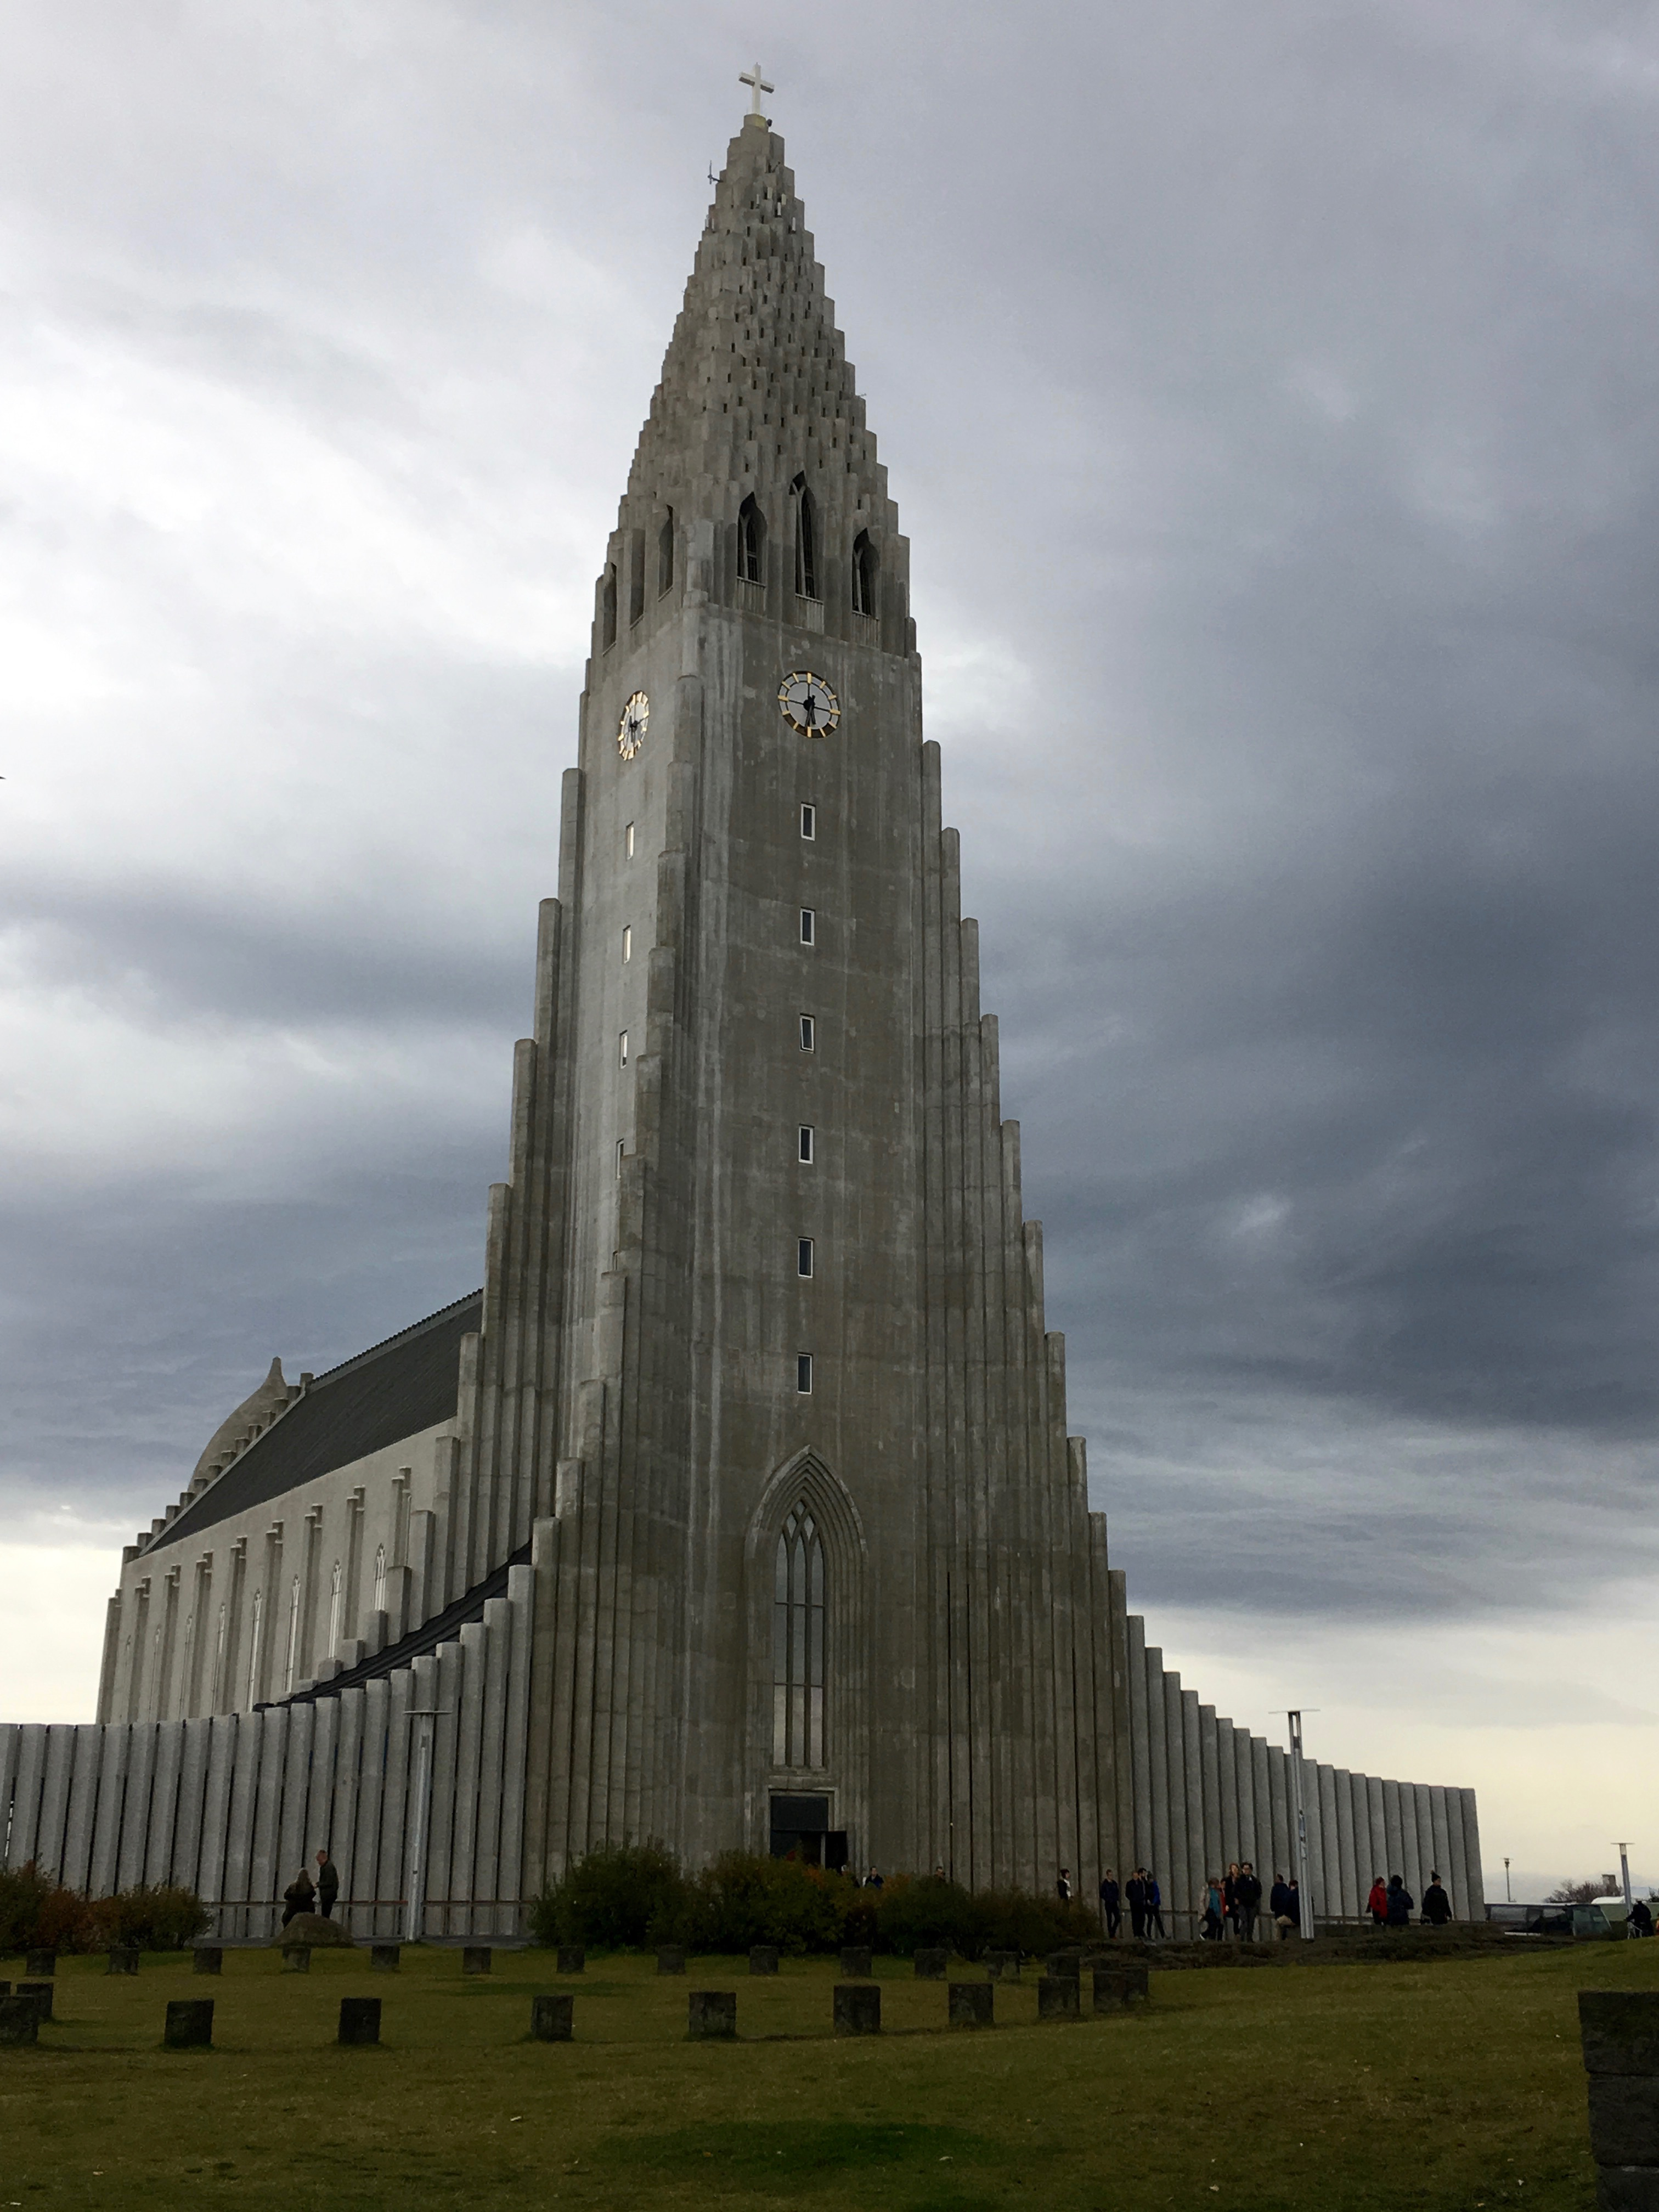 Hallgrimskirkja Cathedral in Reykjavik, Iceland. Photo: Tonya Fitzpatrick